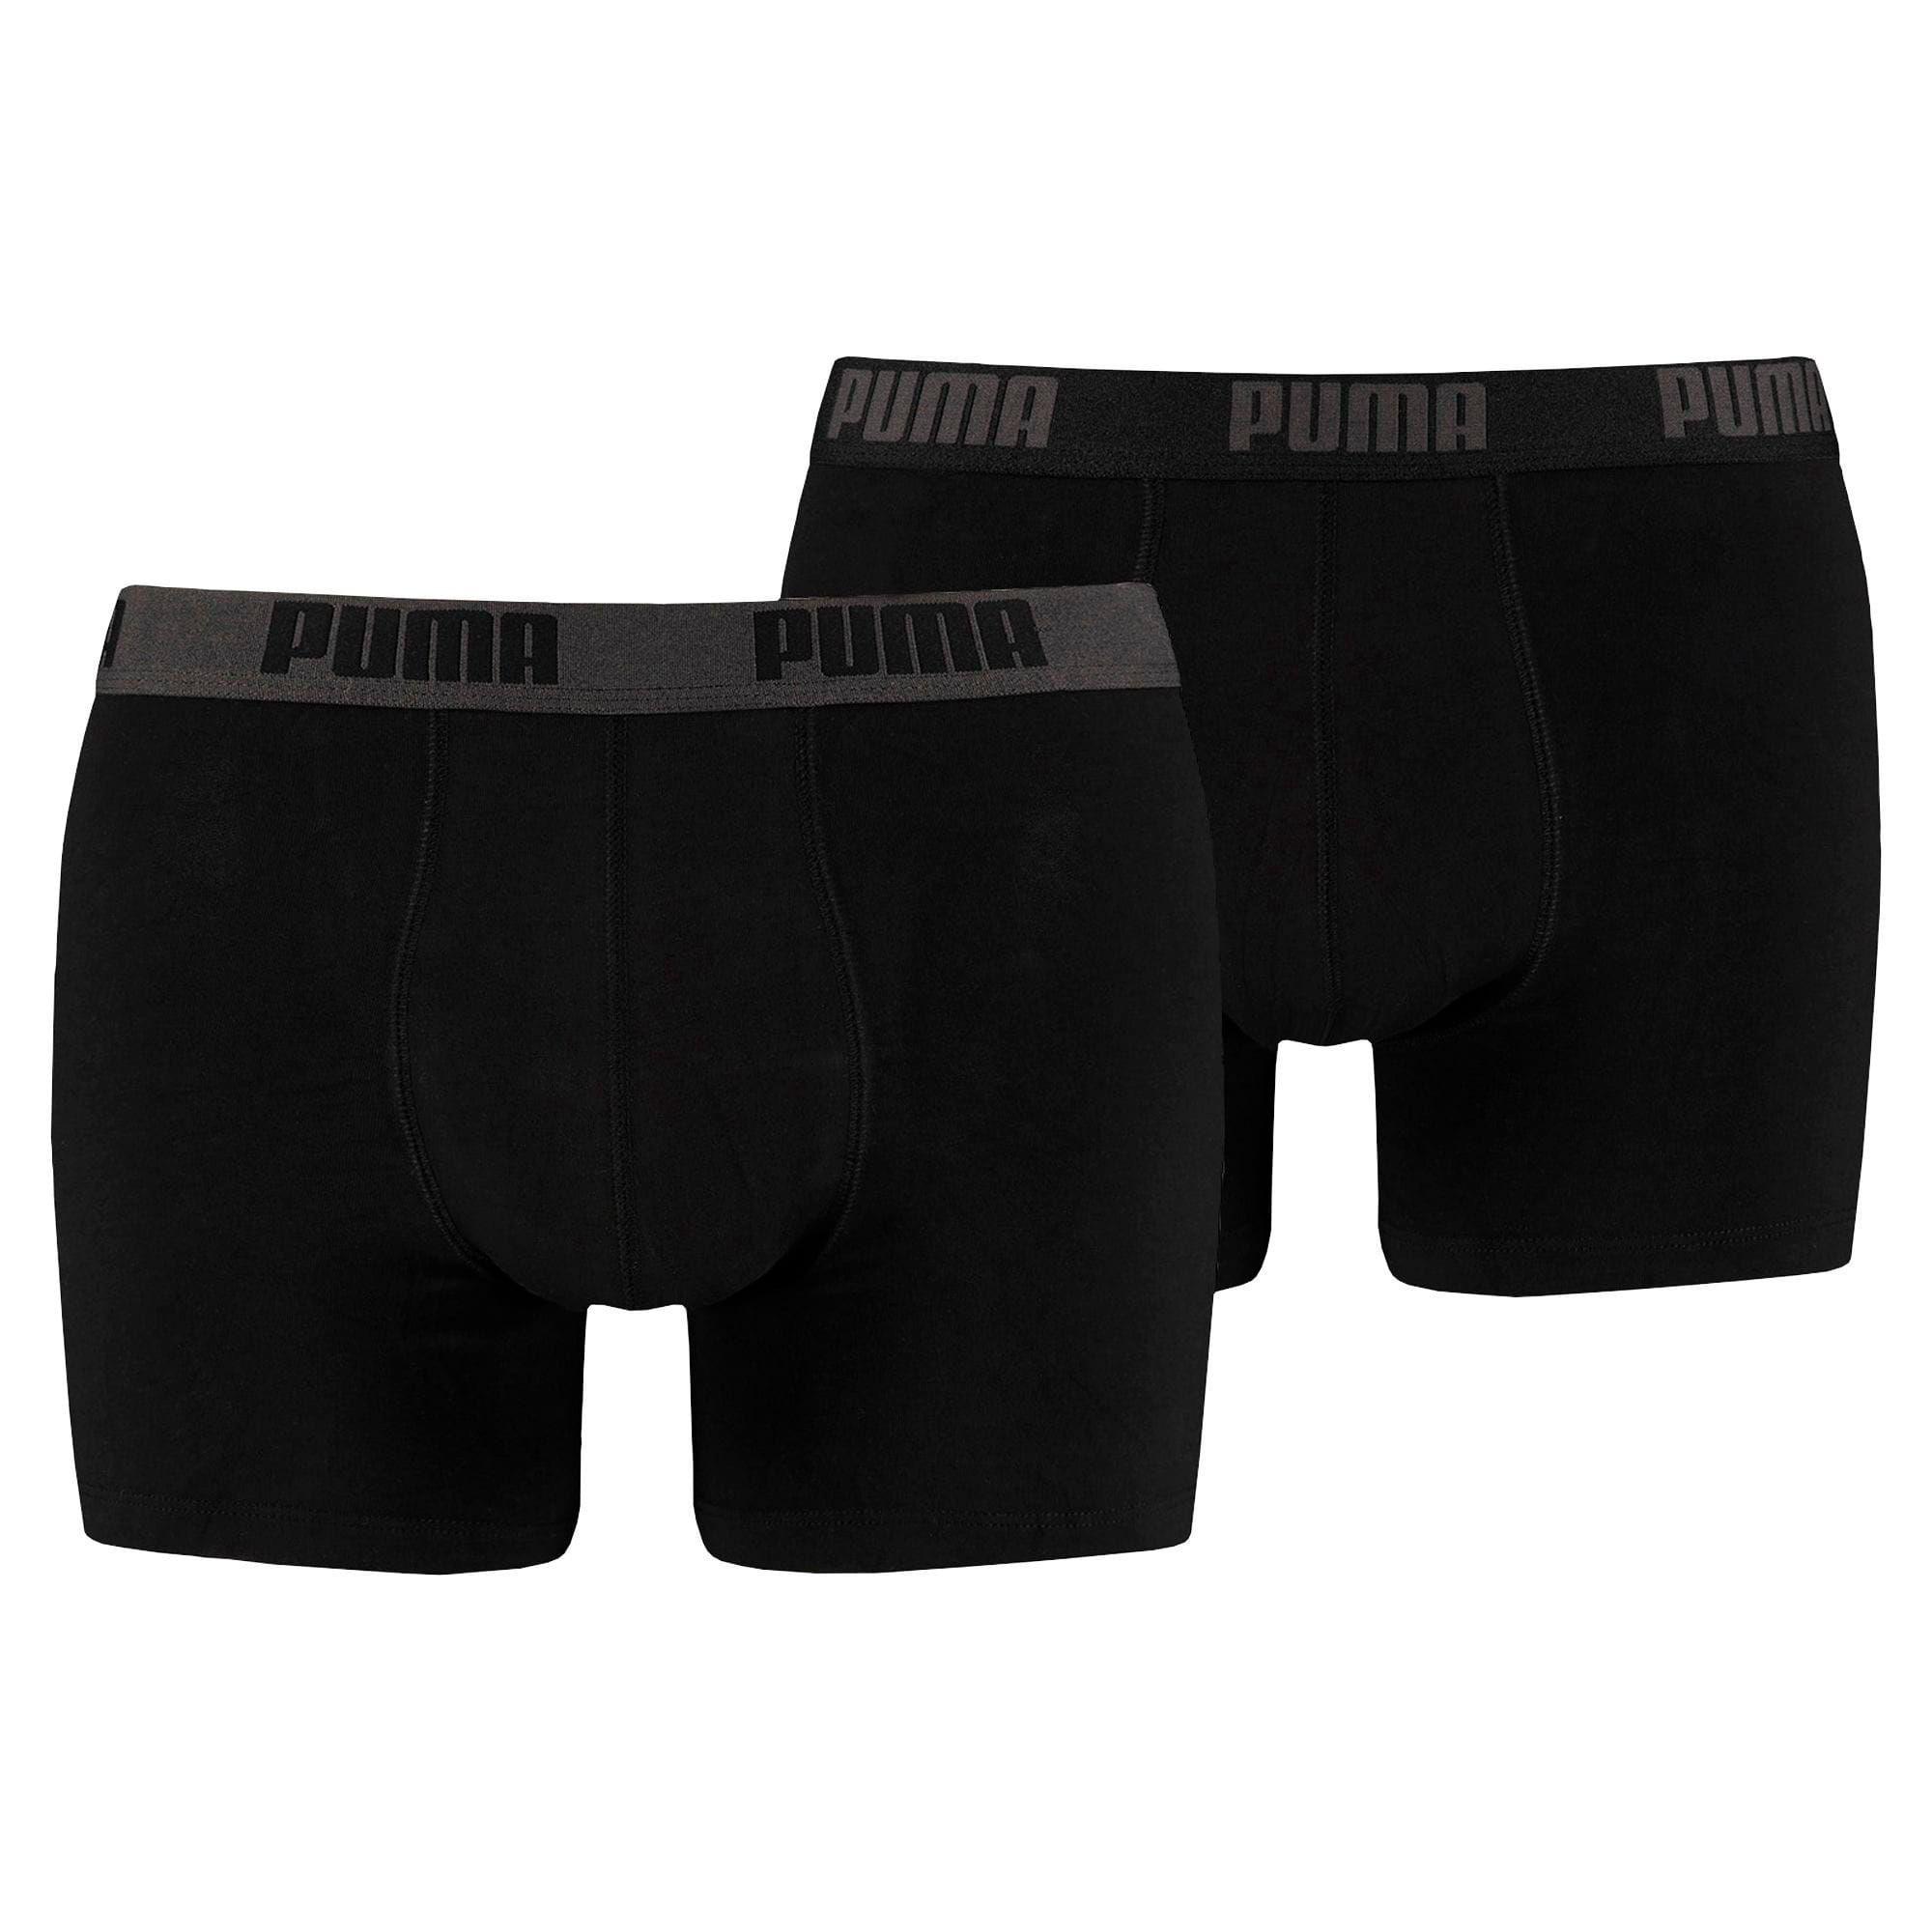 Basic Men's Boxers 2 pack | black / black | PUMA New Arrivals ...